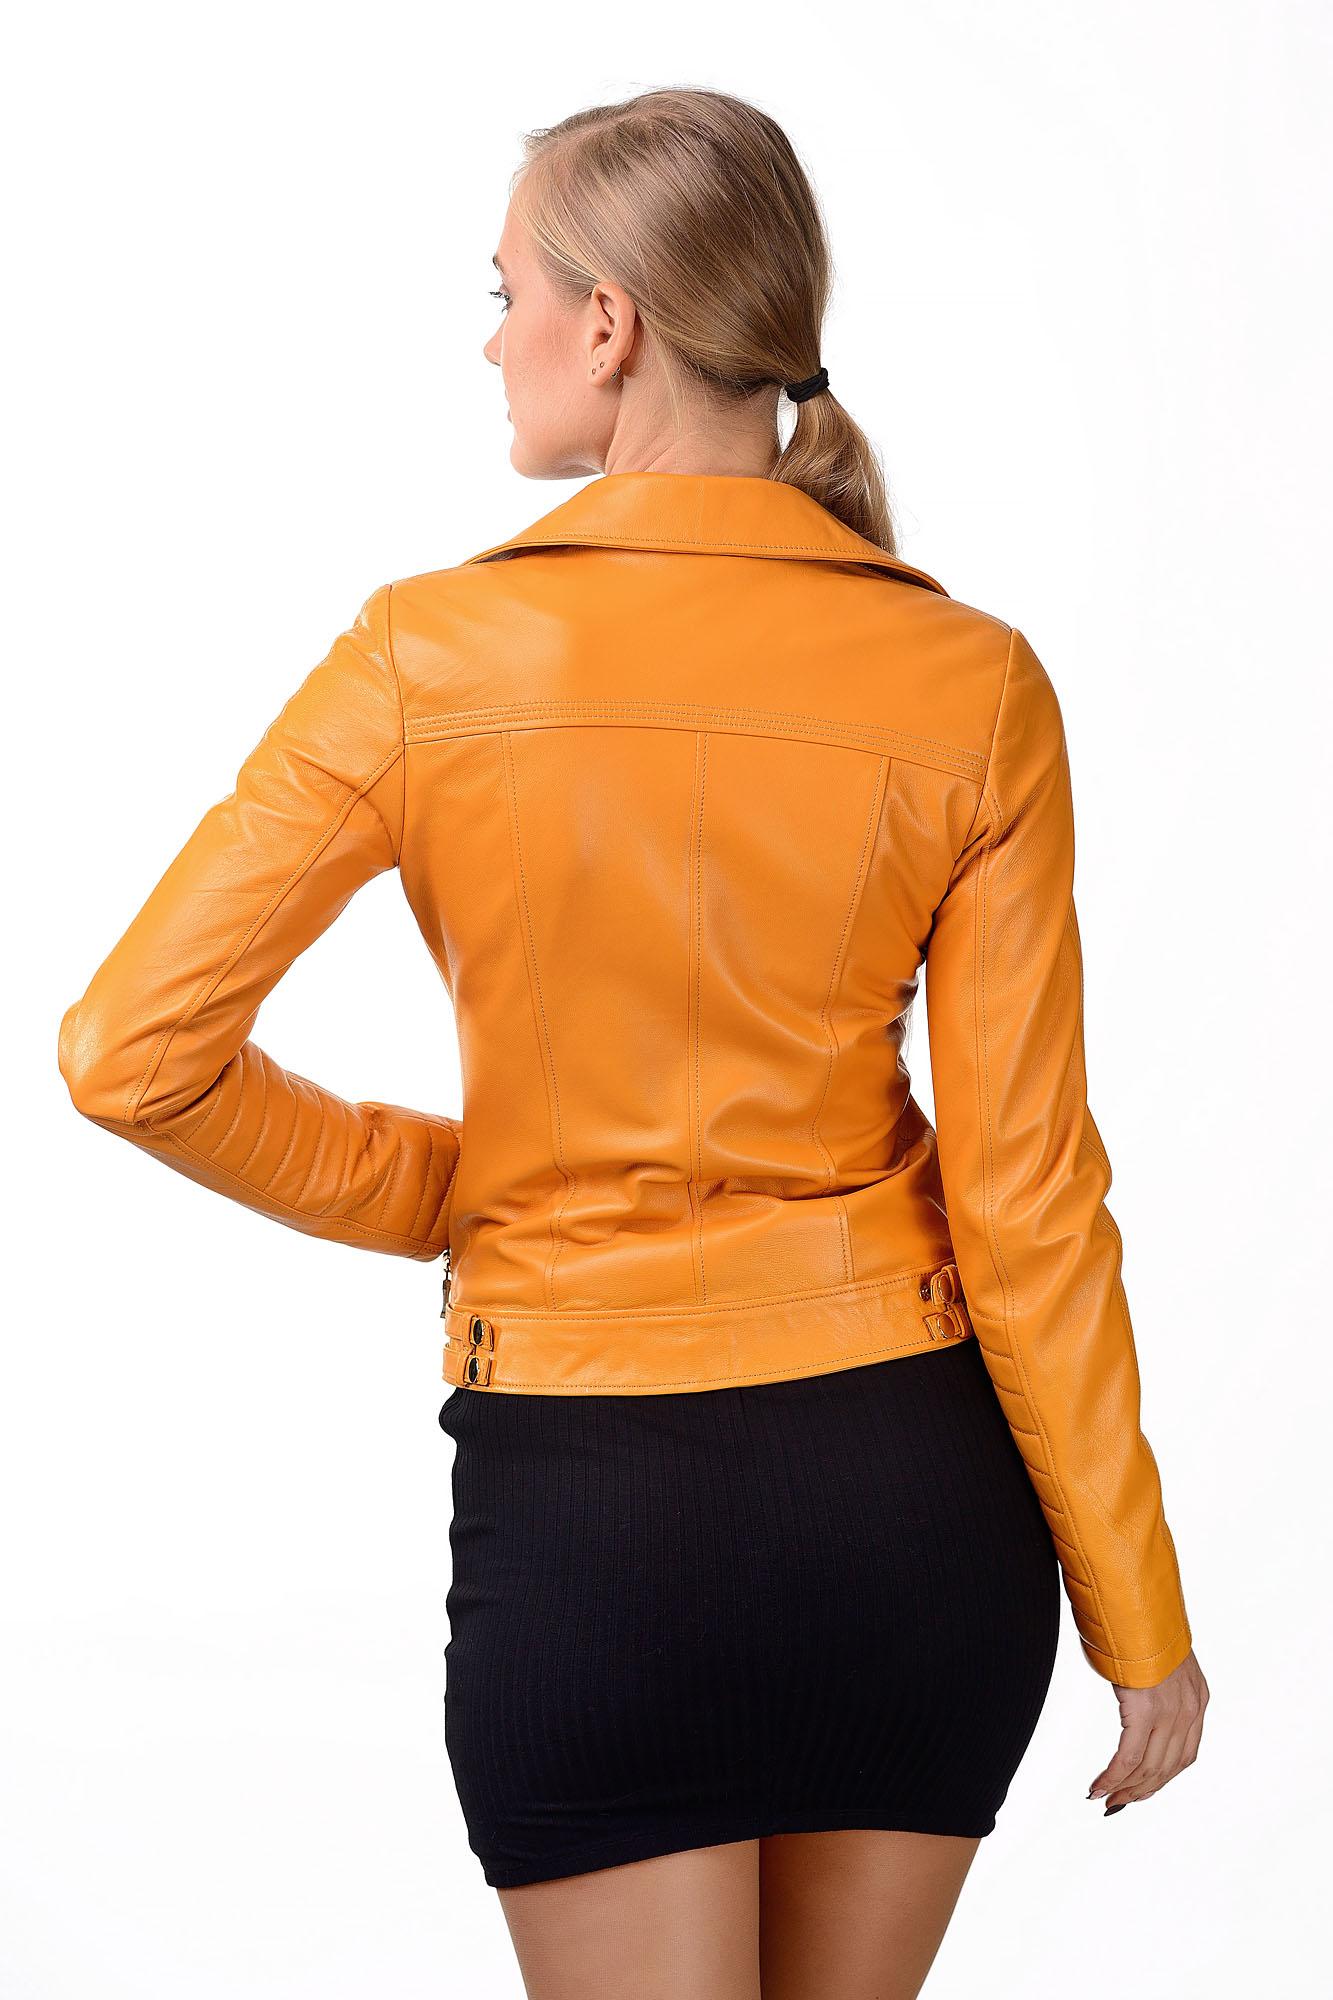 Женская кожаная куртка — косухаM=172